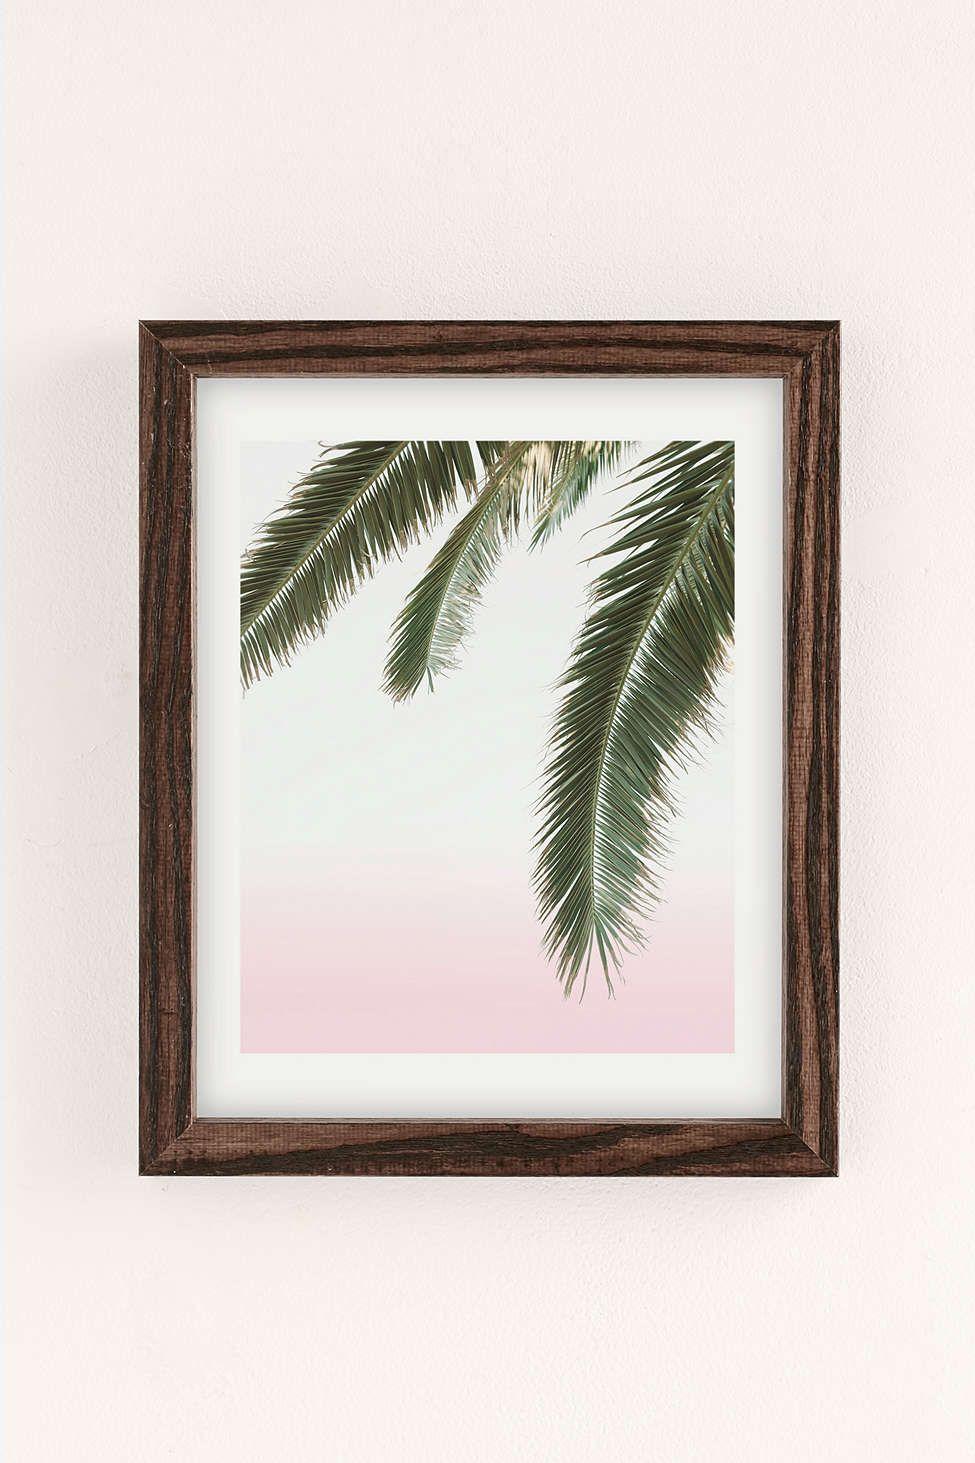 Wilder california hanging palm art print apartment ideas spaces